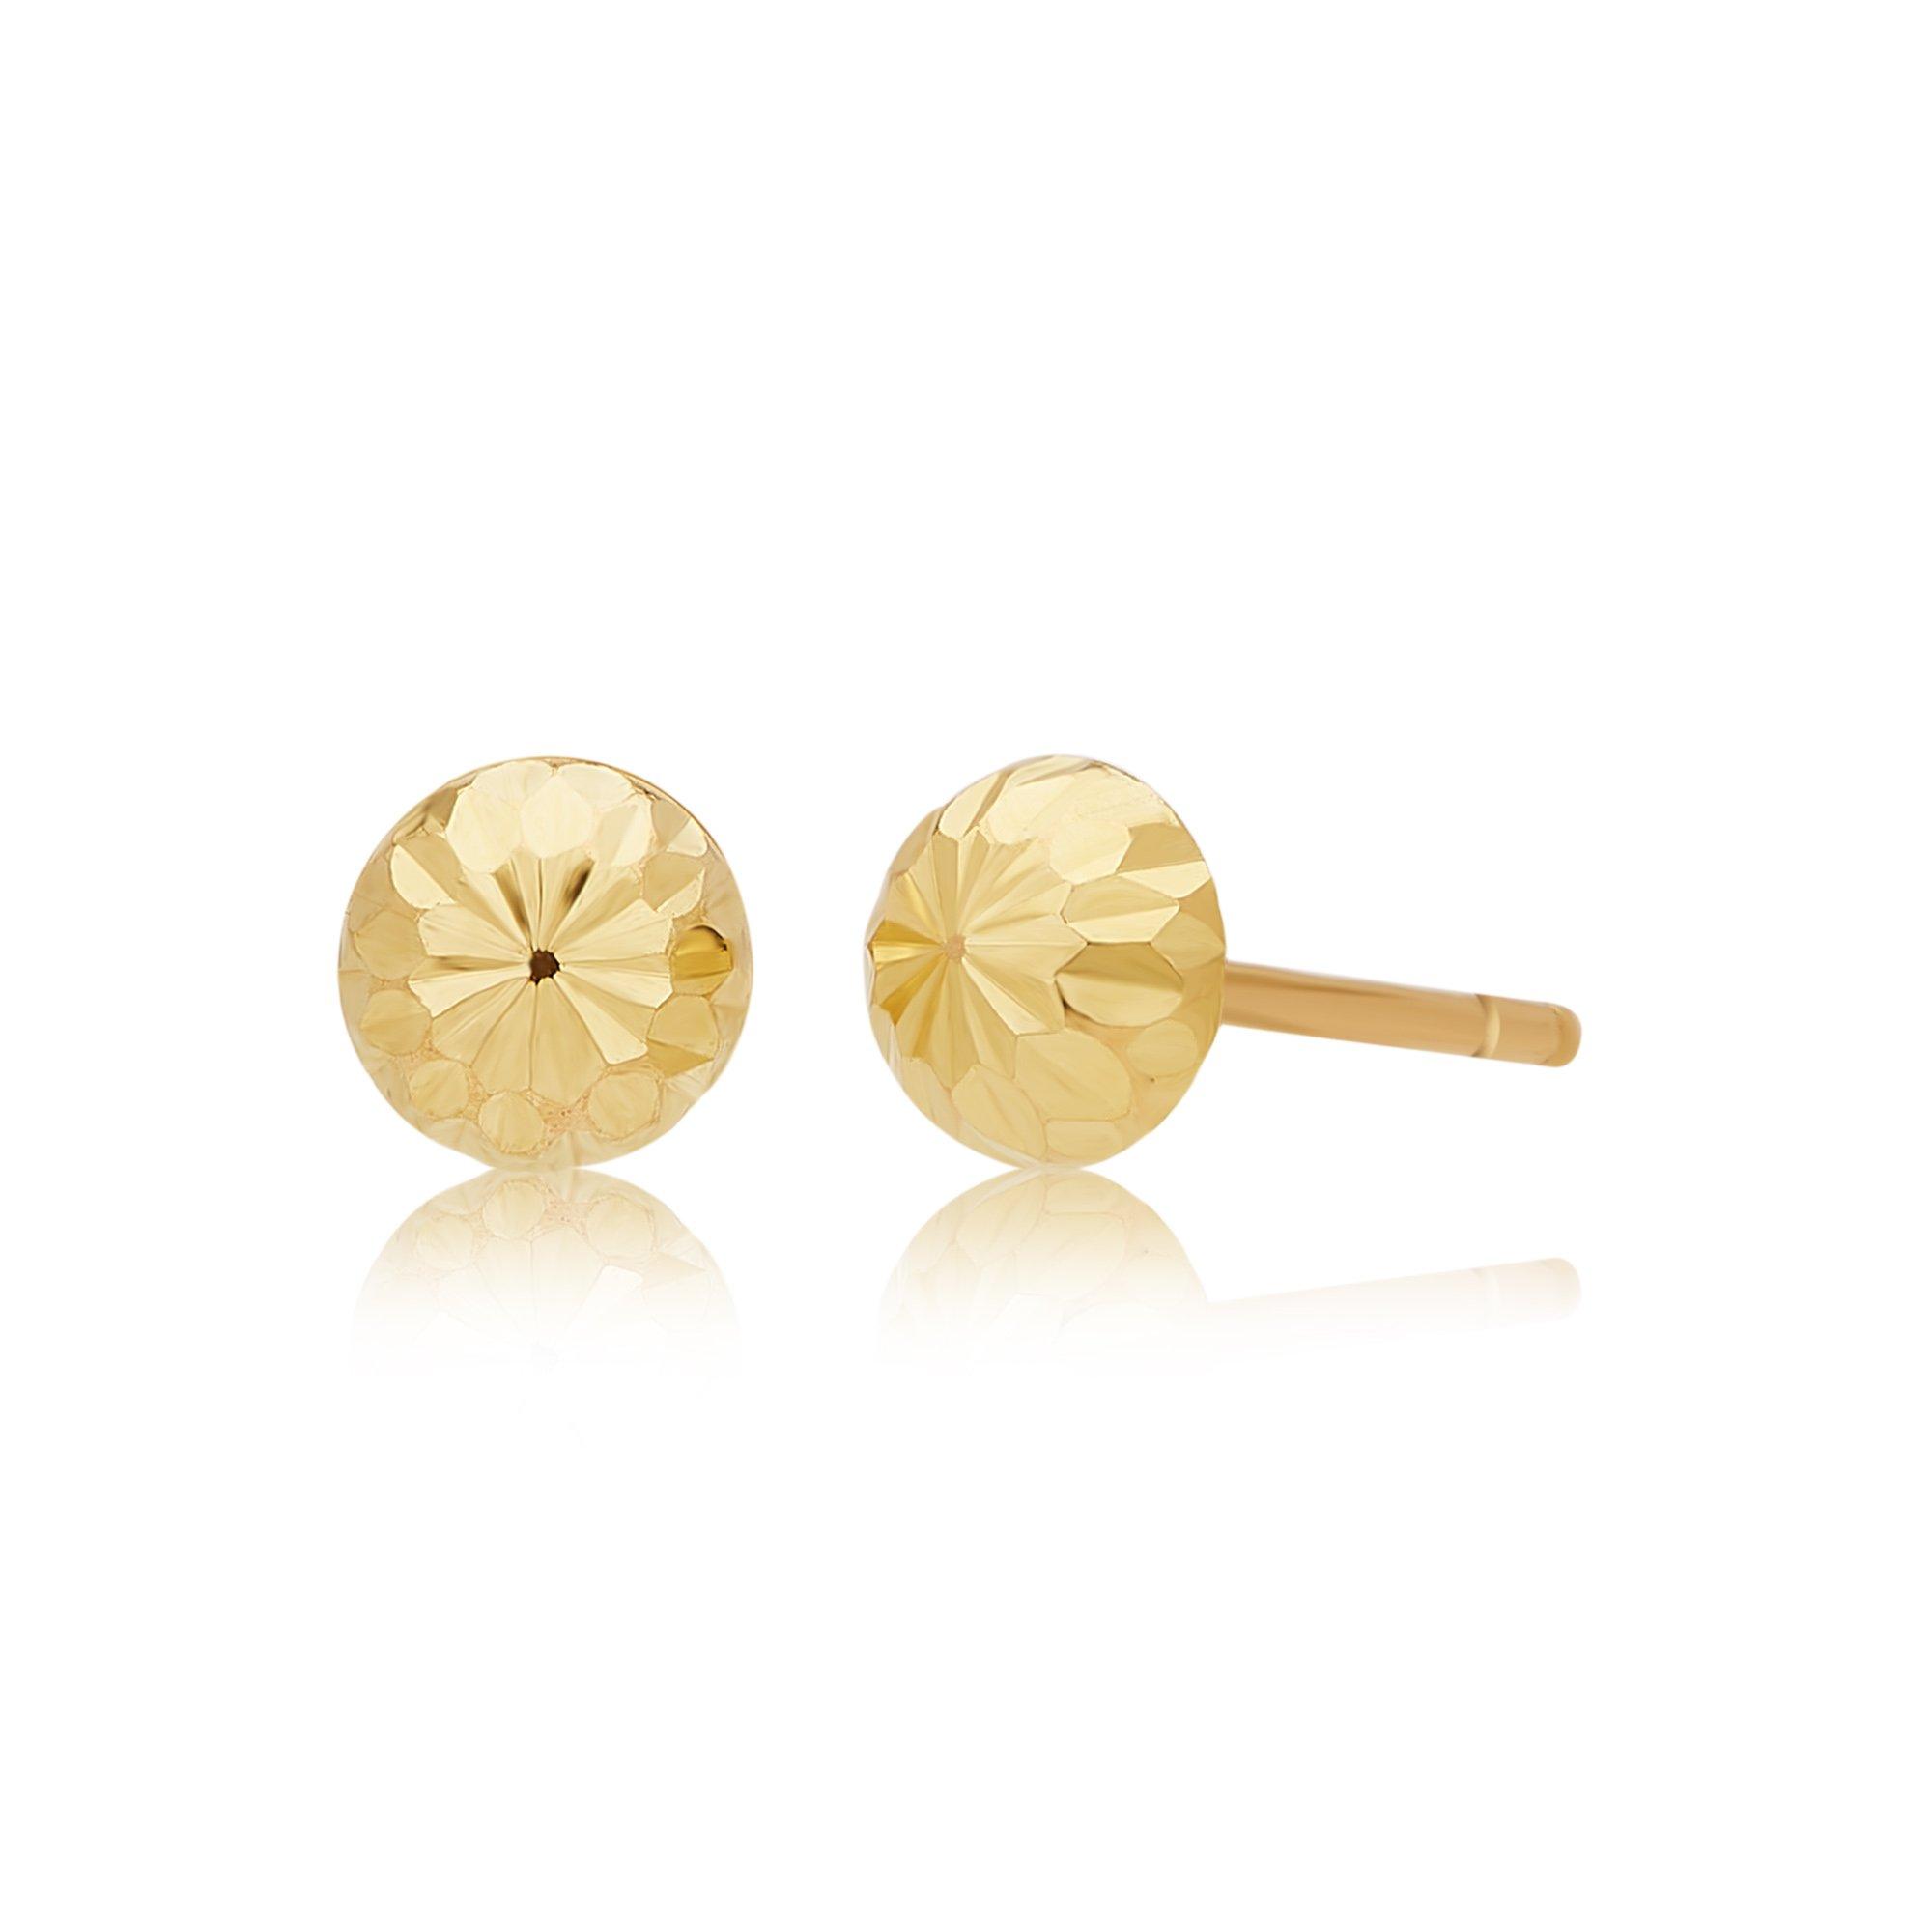 14k Yellow Gold 6 mm Half Diamond Cut Ball Stud Earring